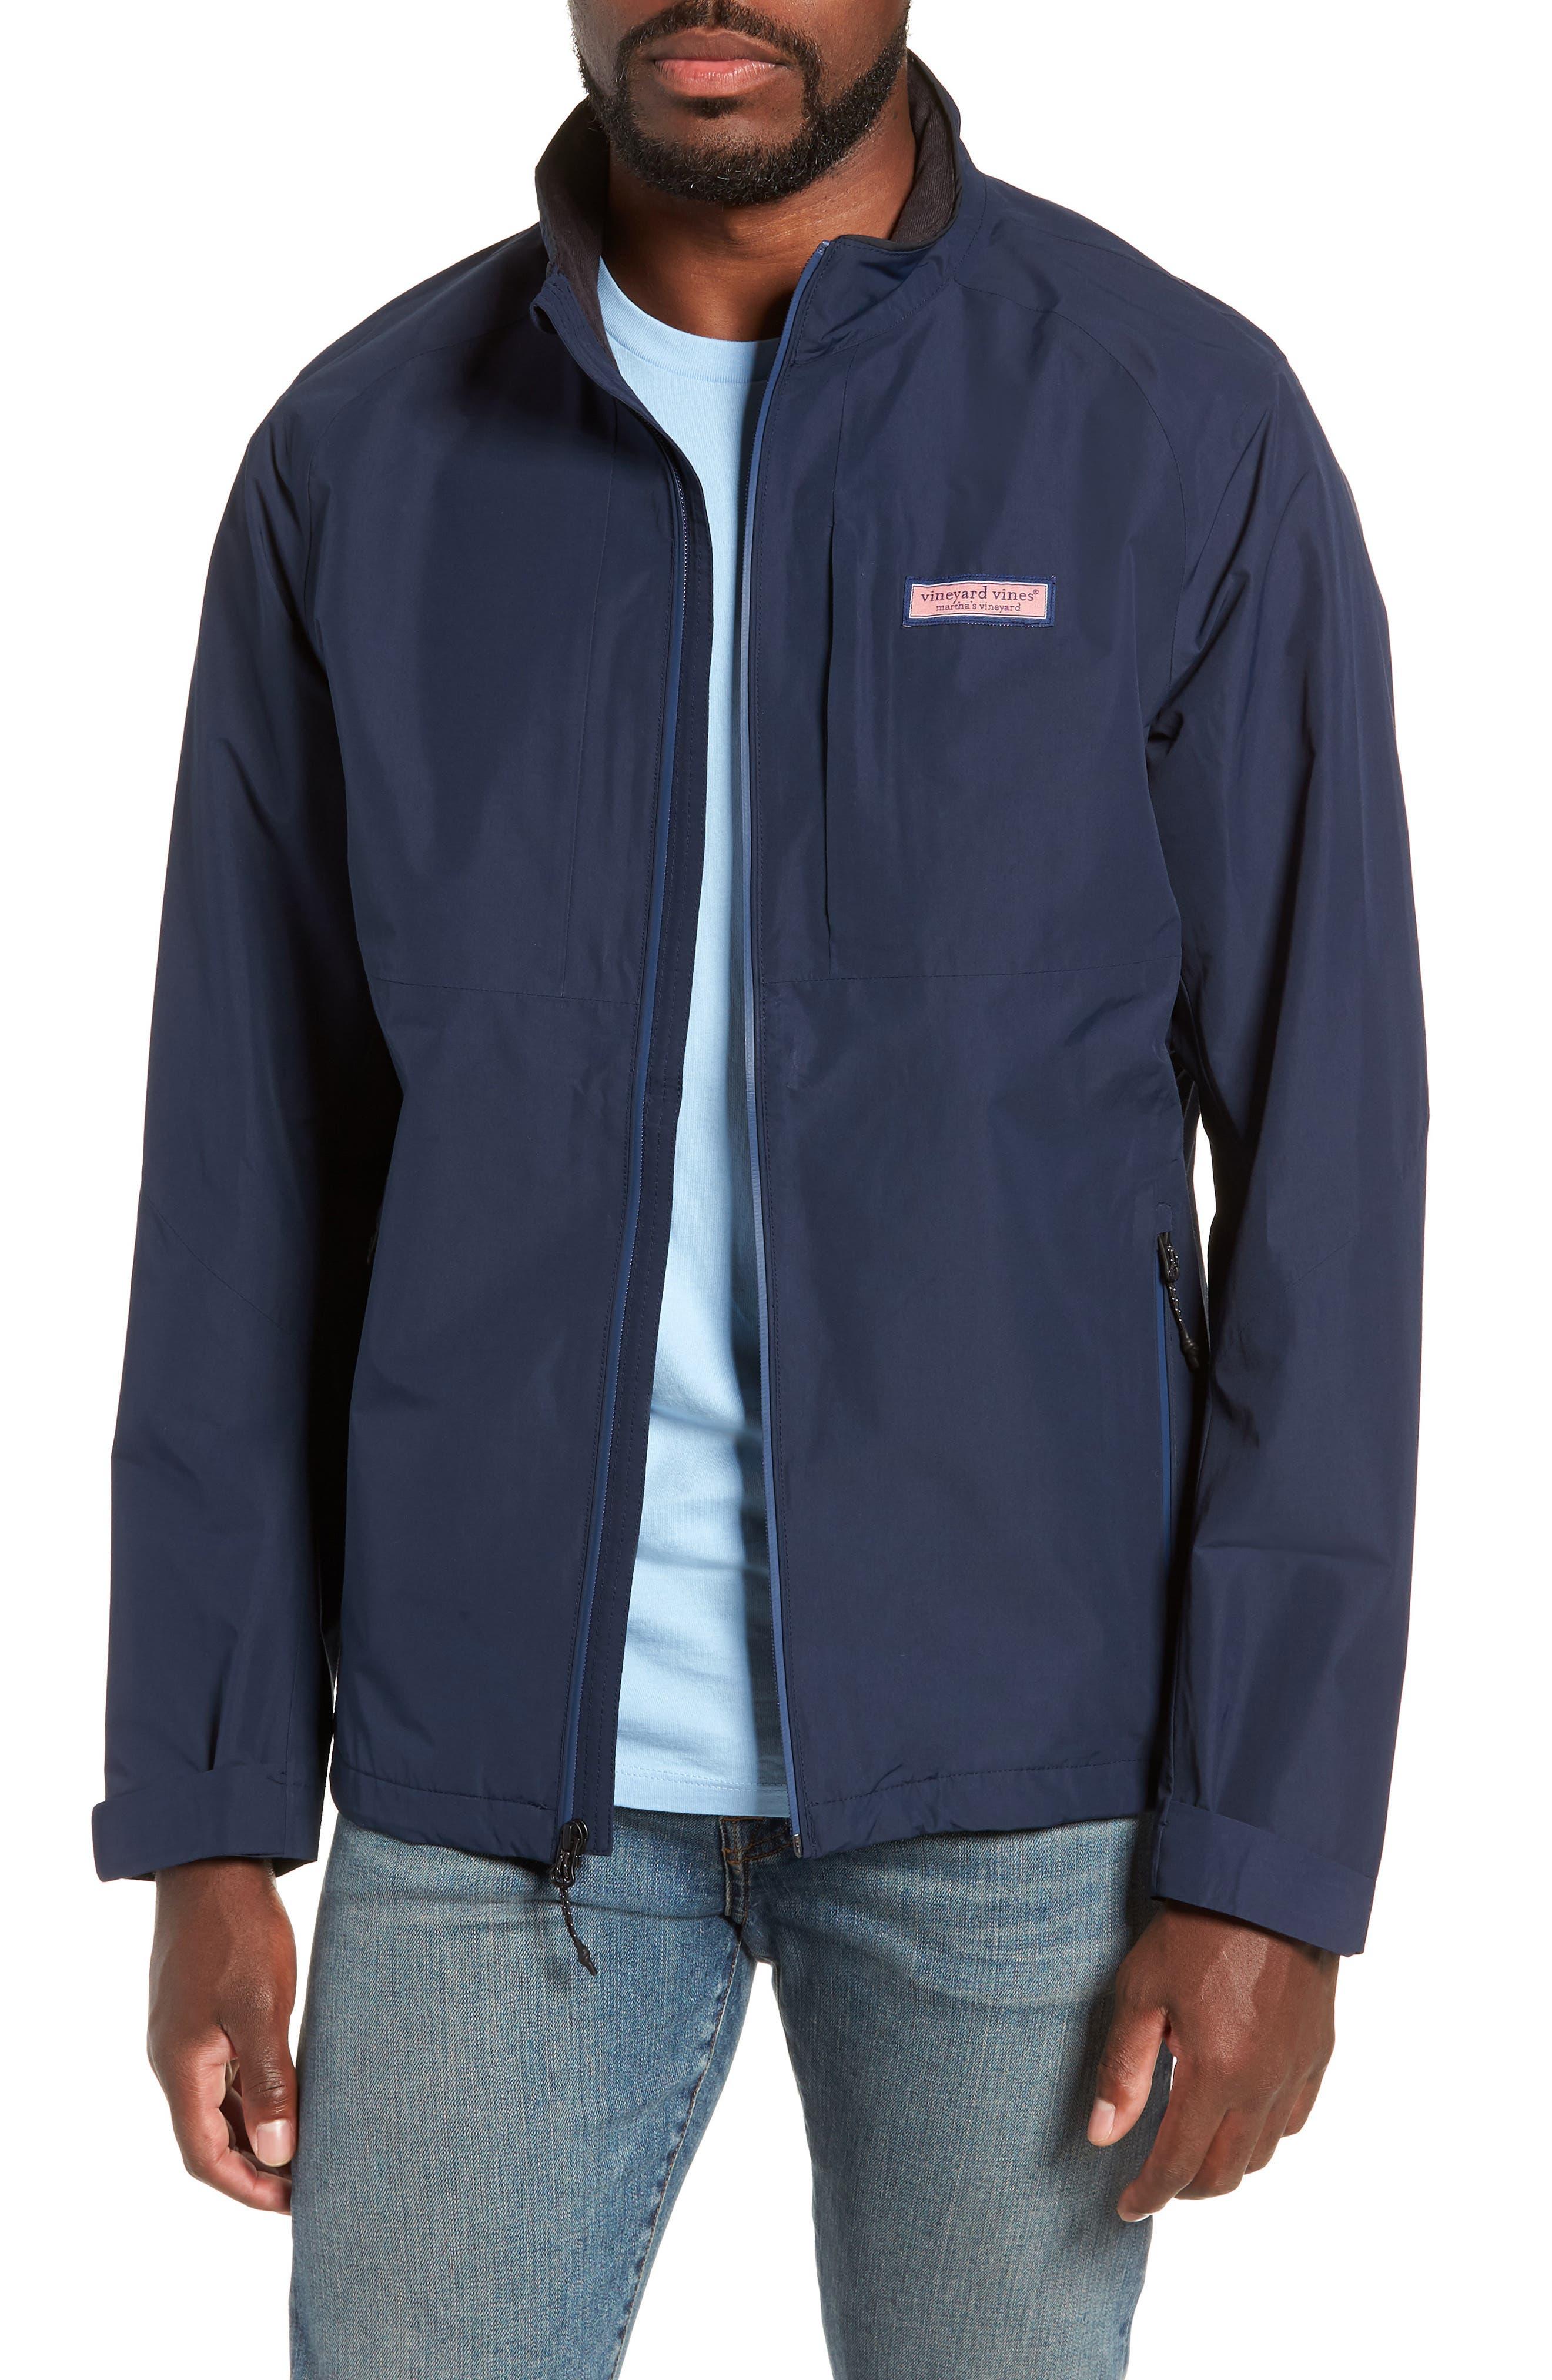 Regatta Performance Jacket,                             Main thumbnail 1, color,                             410